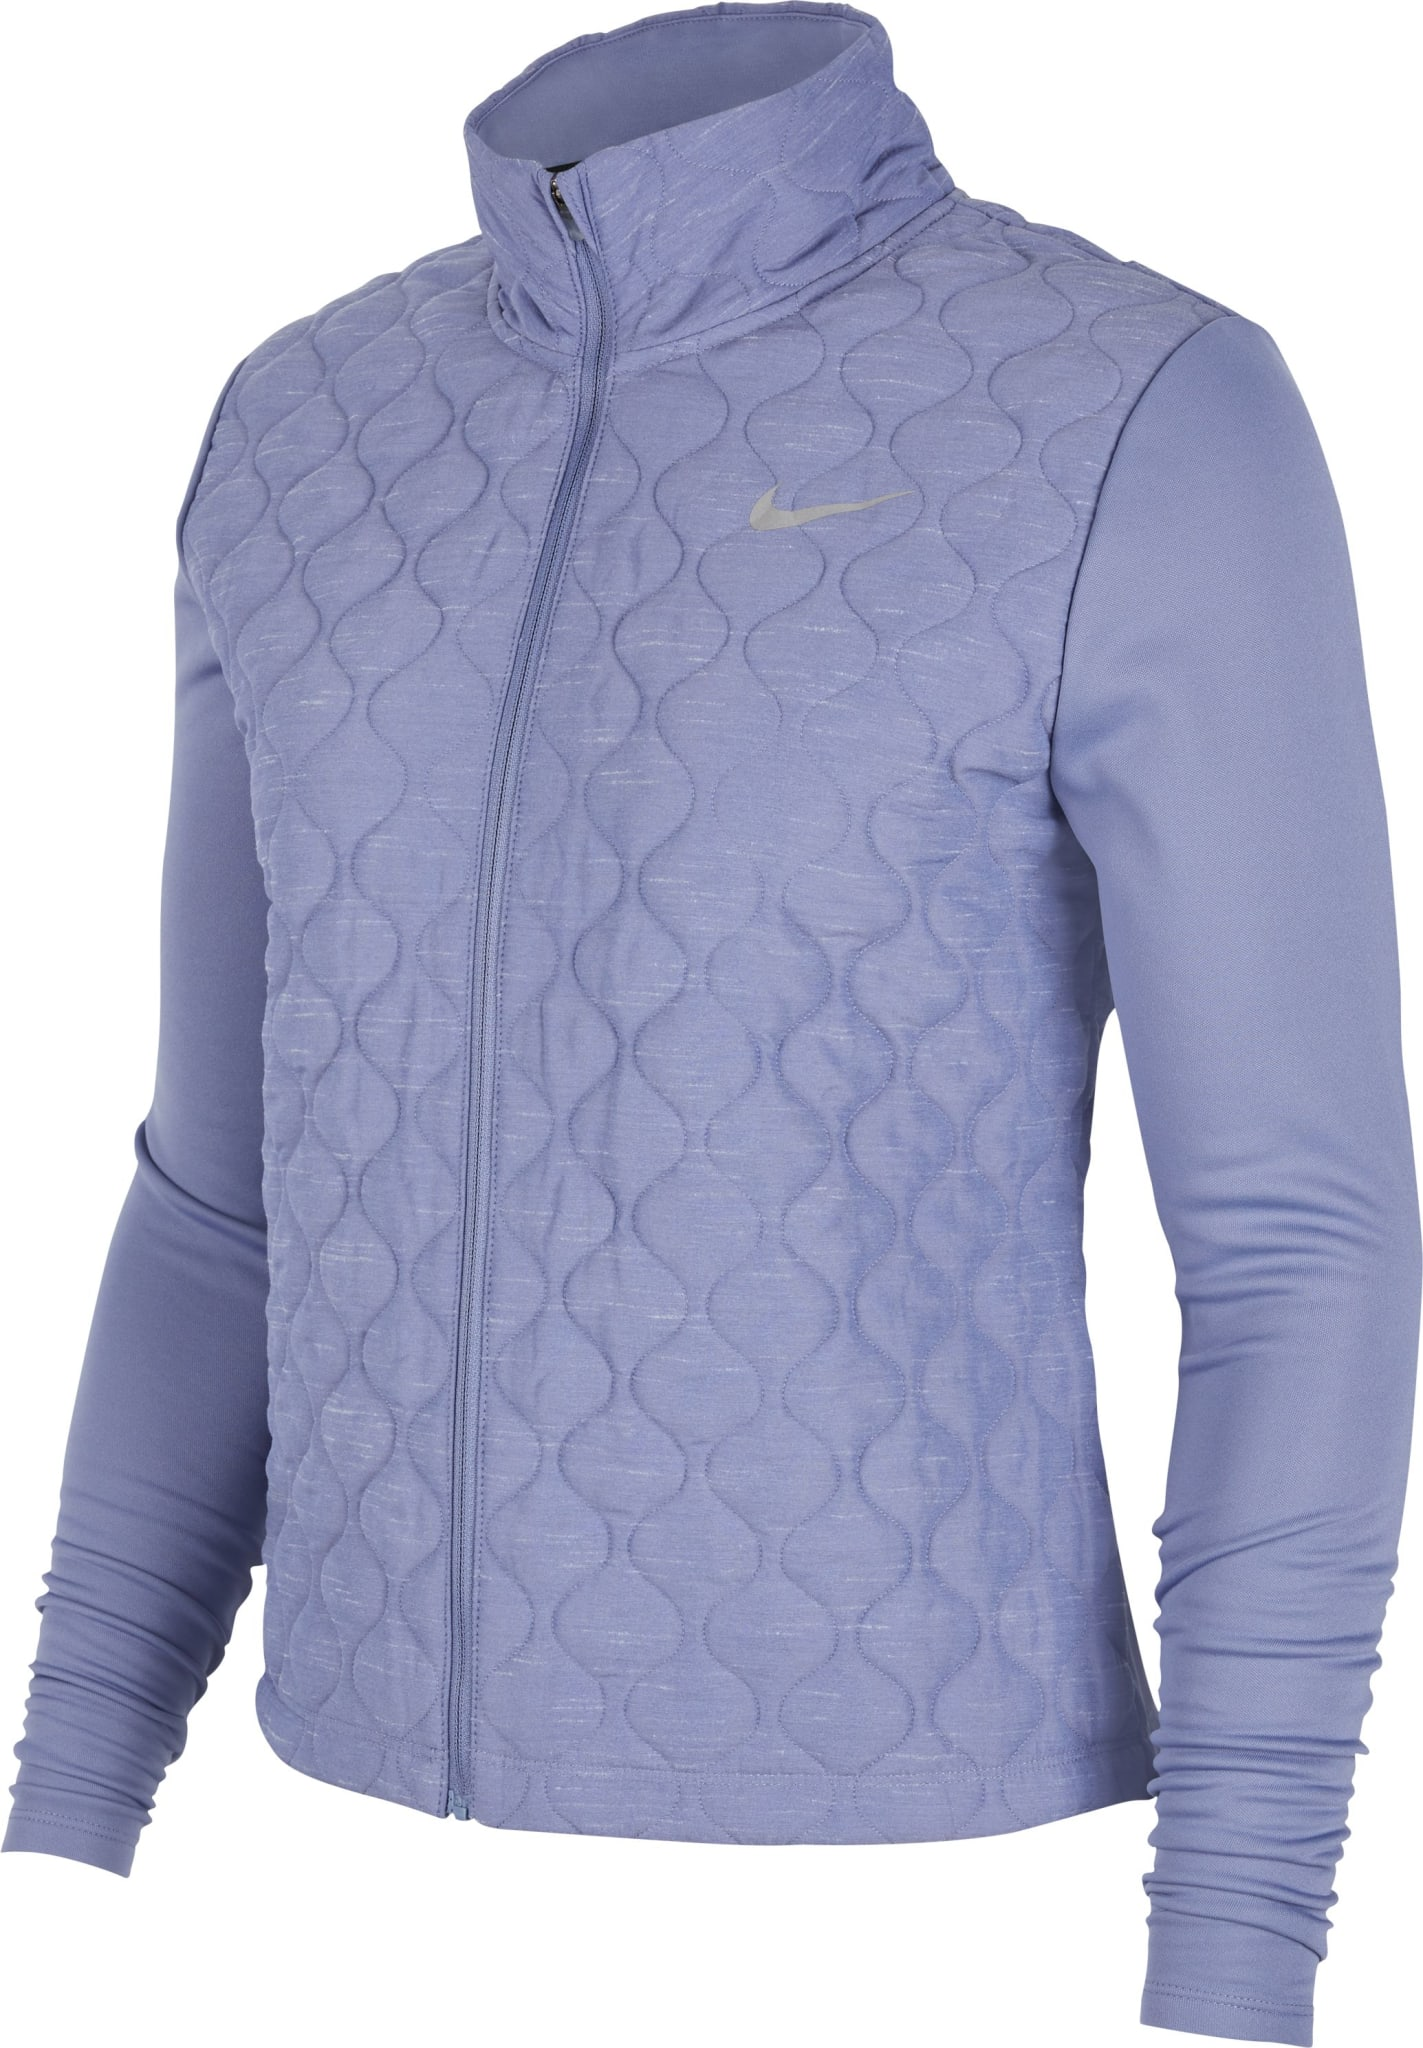 Aerolayer Women's Running Jacket